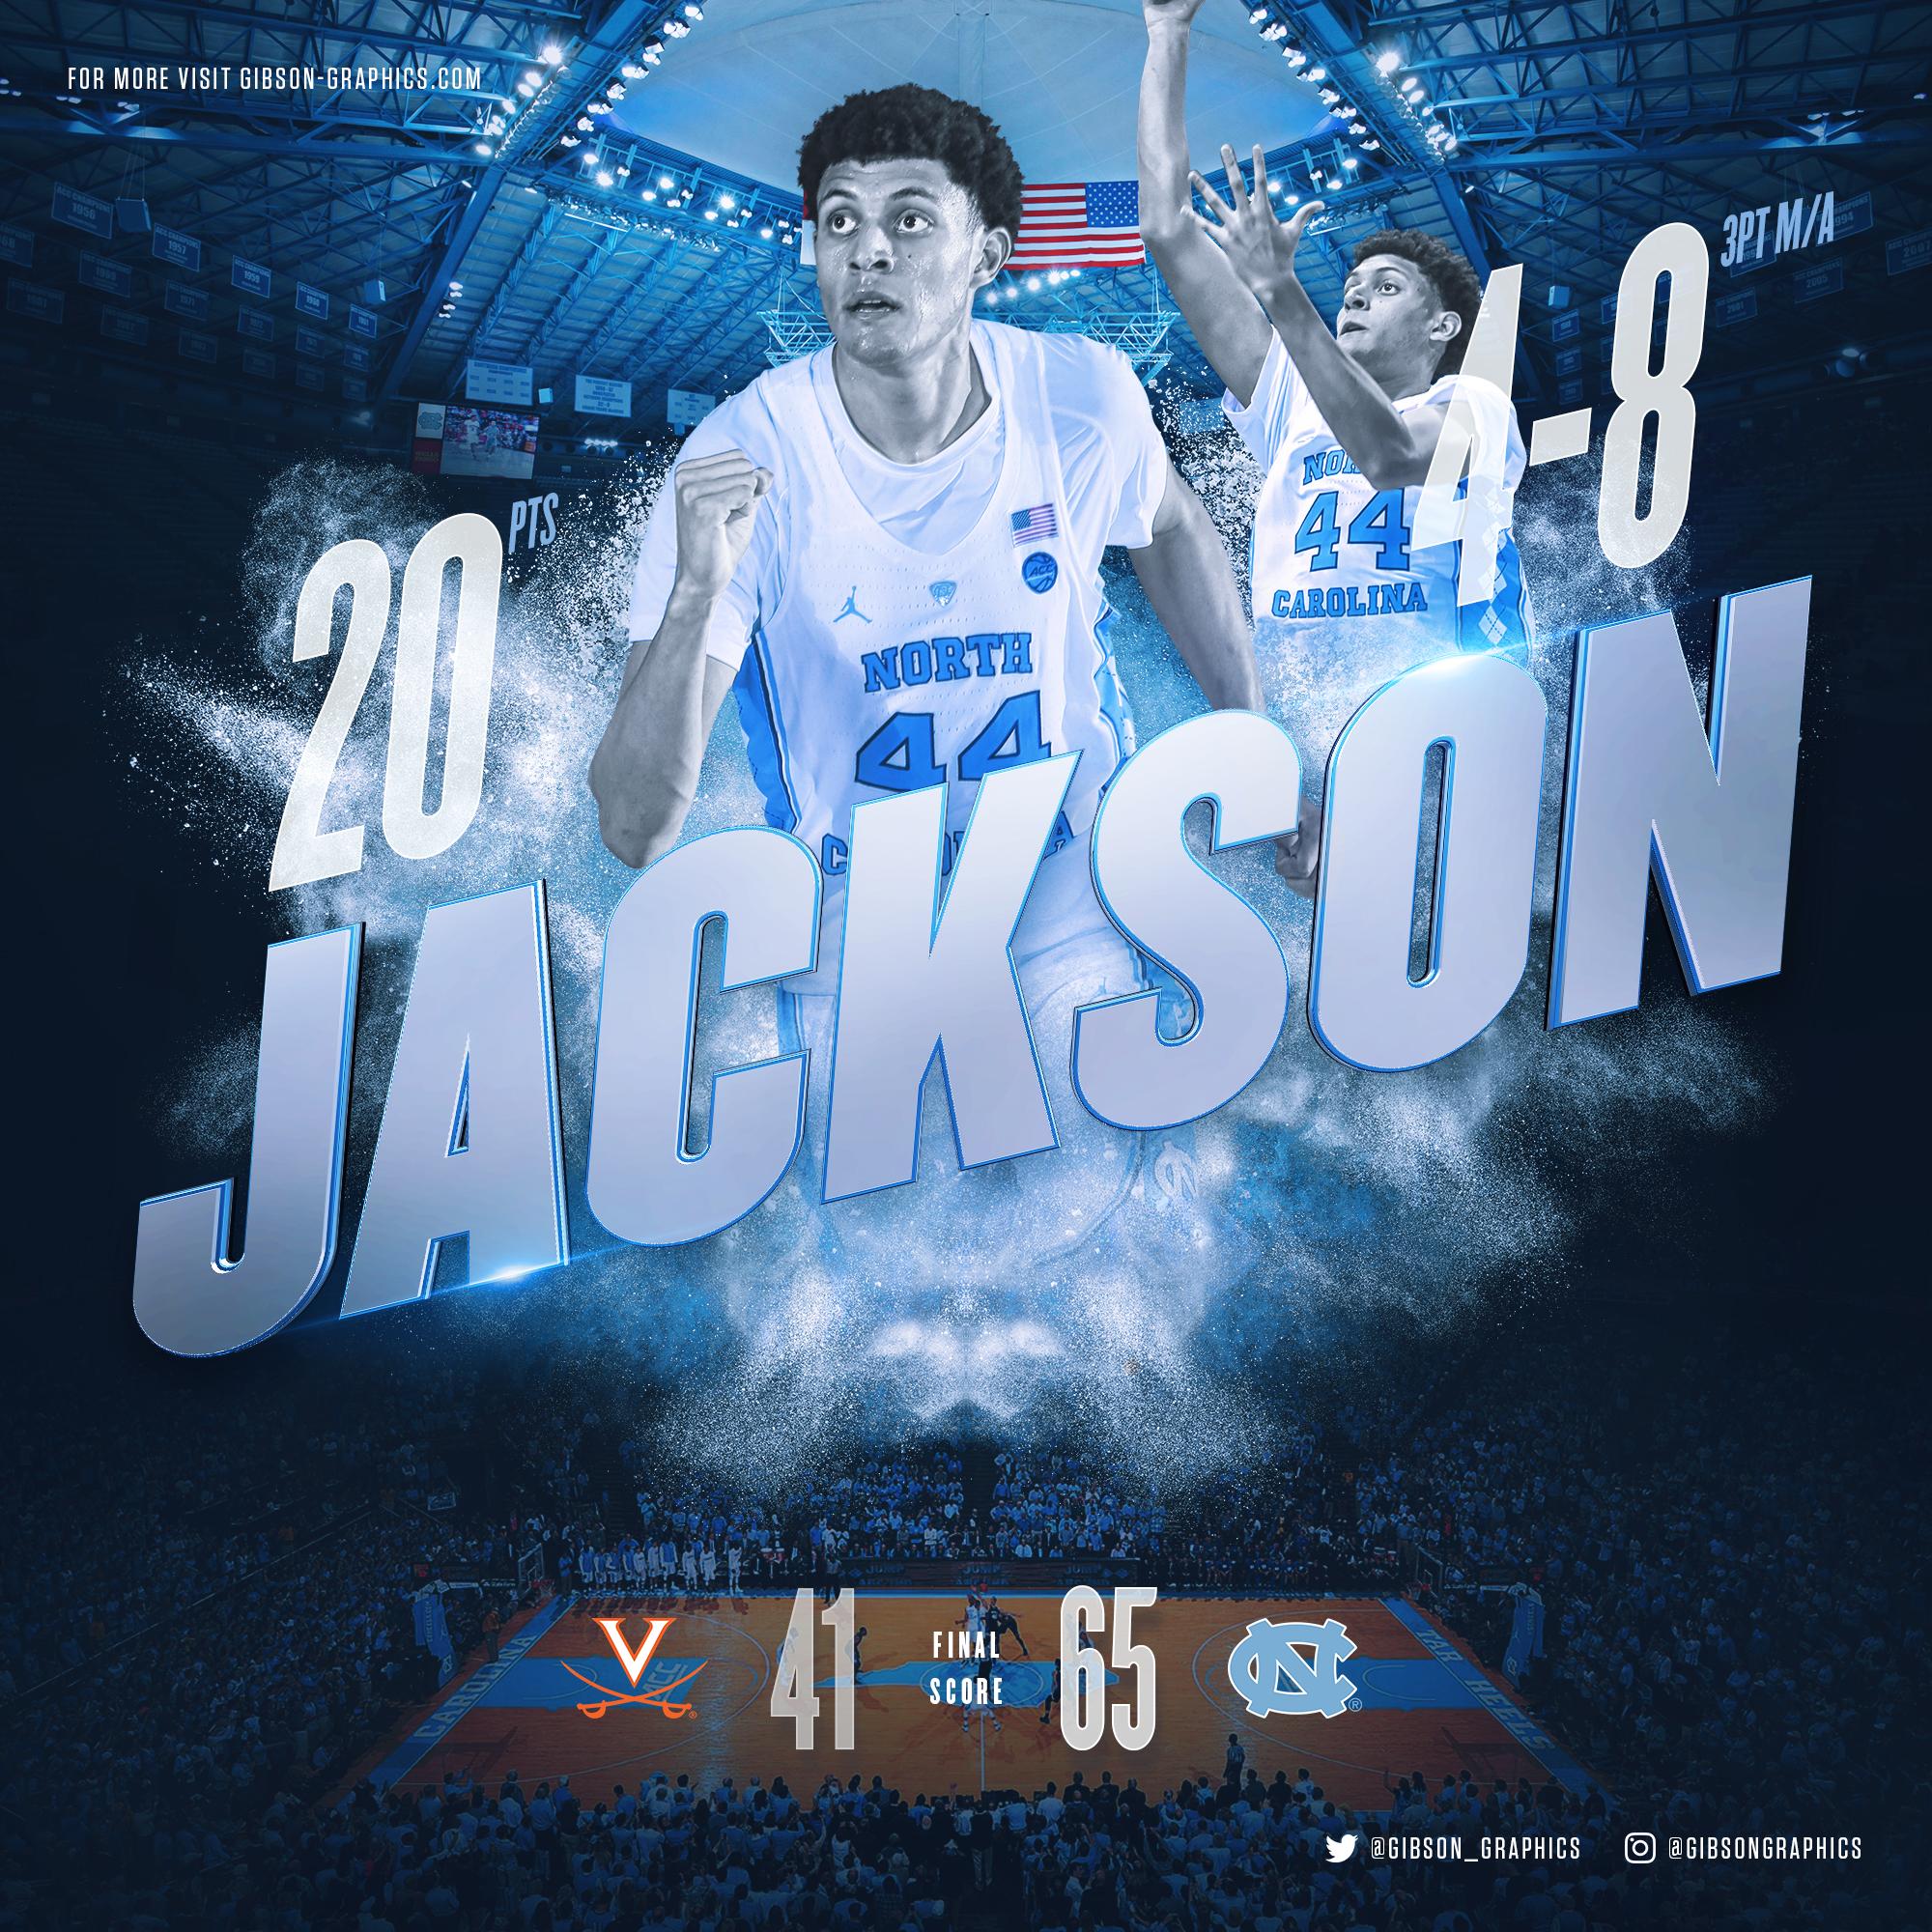 Justin Jackson Statline of the Night